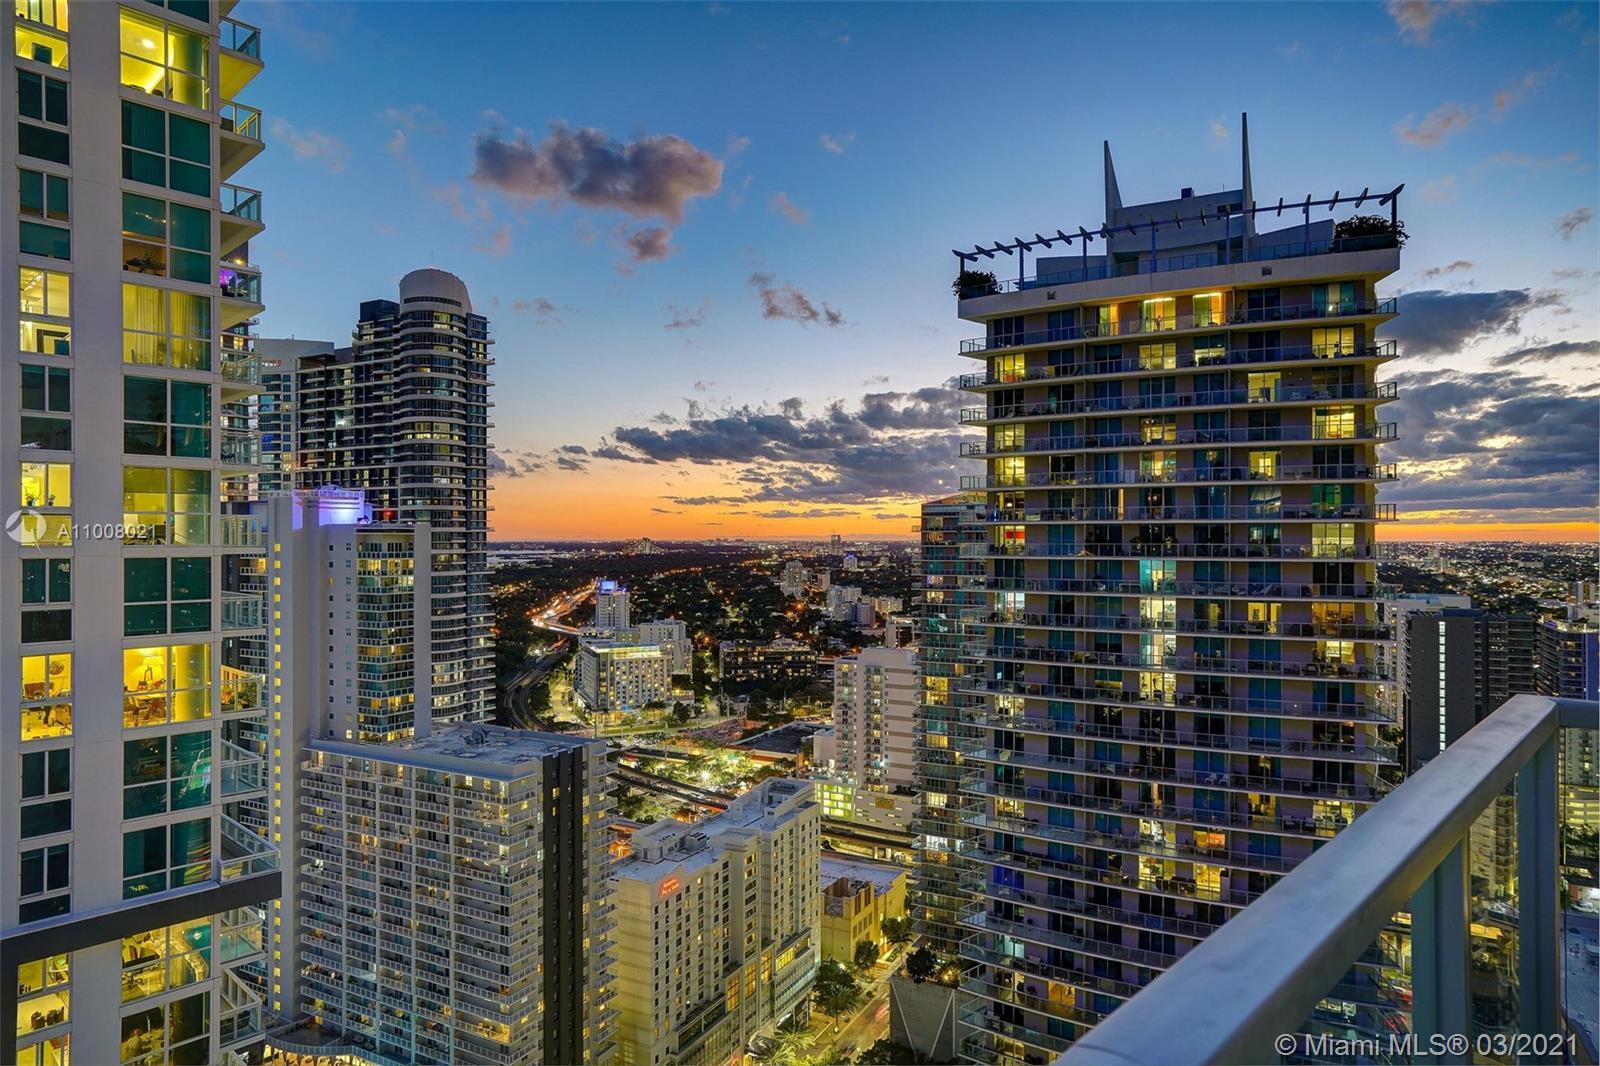 1060 Brickell East Tower #PH3504 - 1050 Brickell Ave #PH3504, Miami, FL 33131